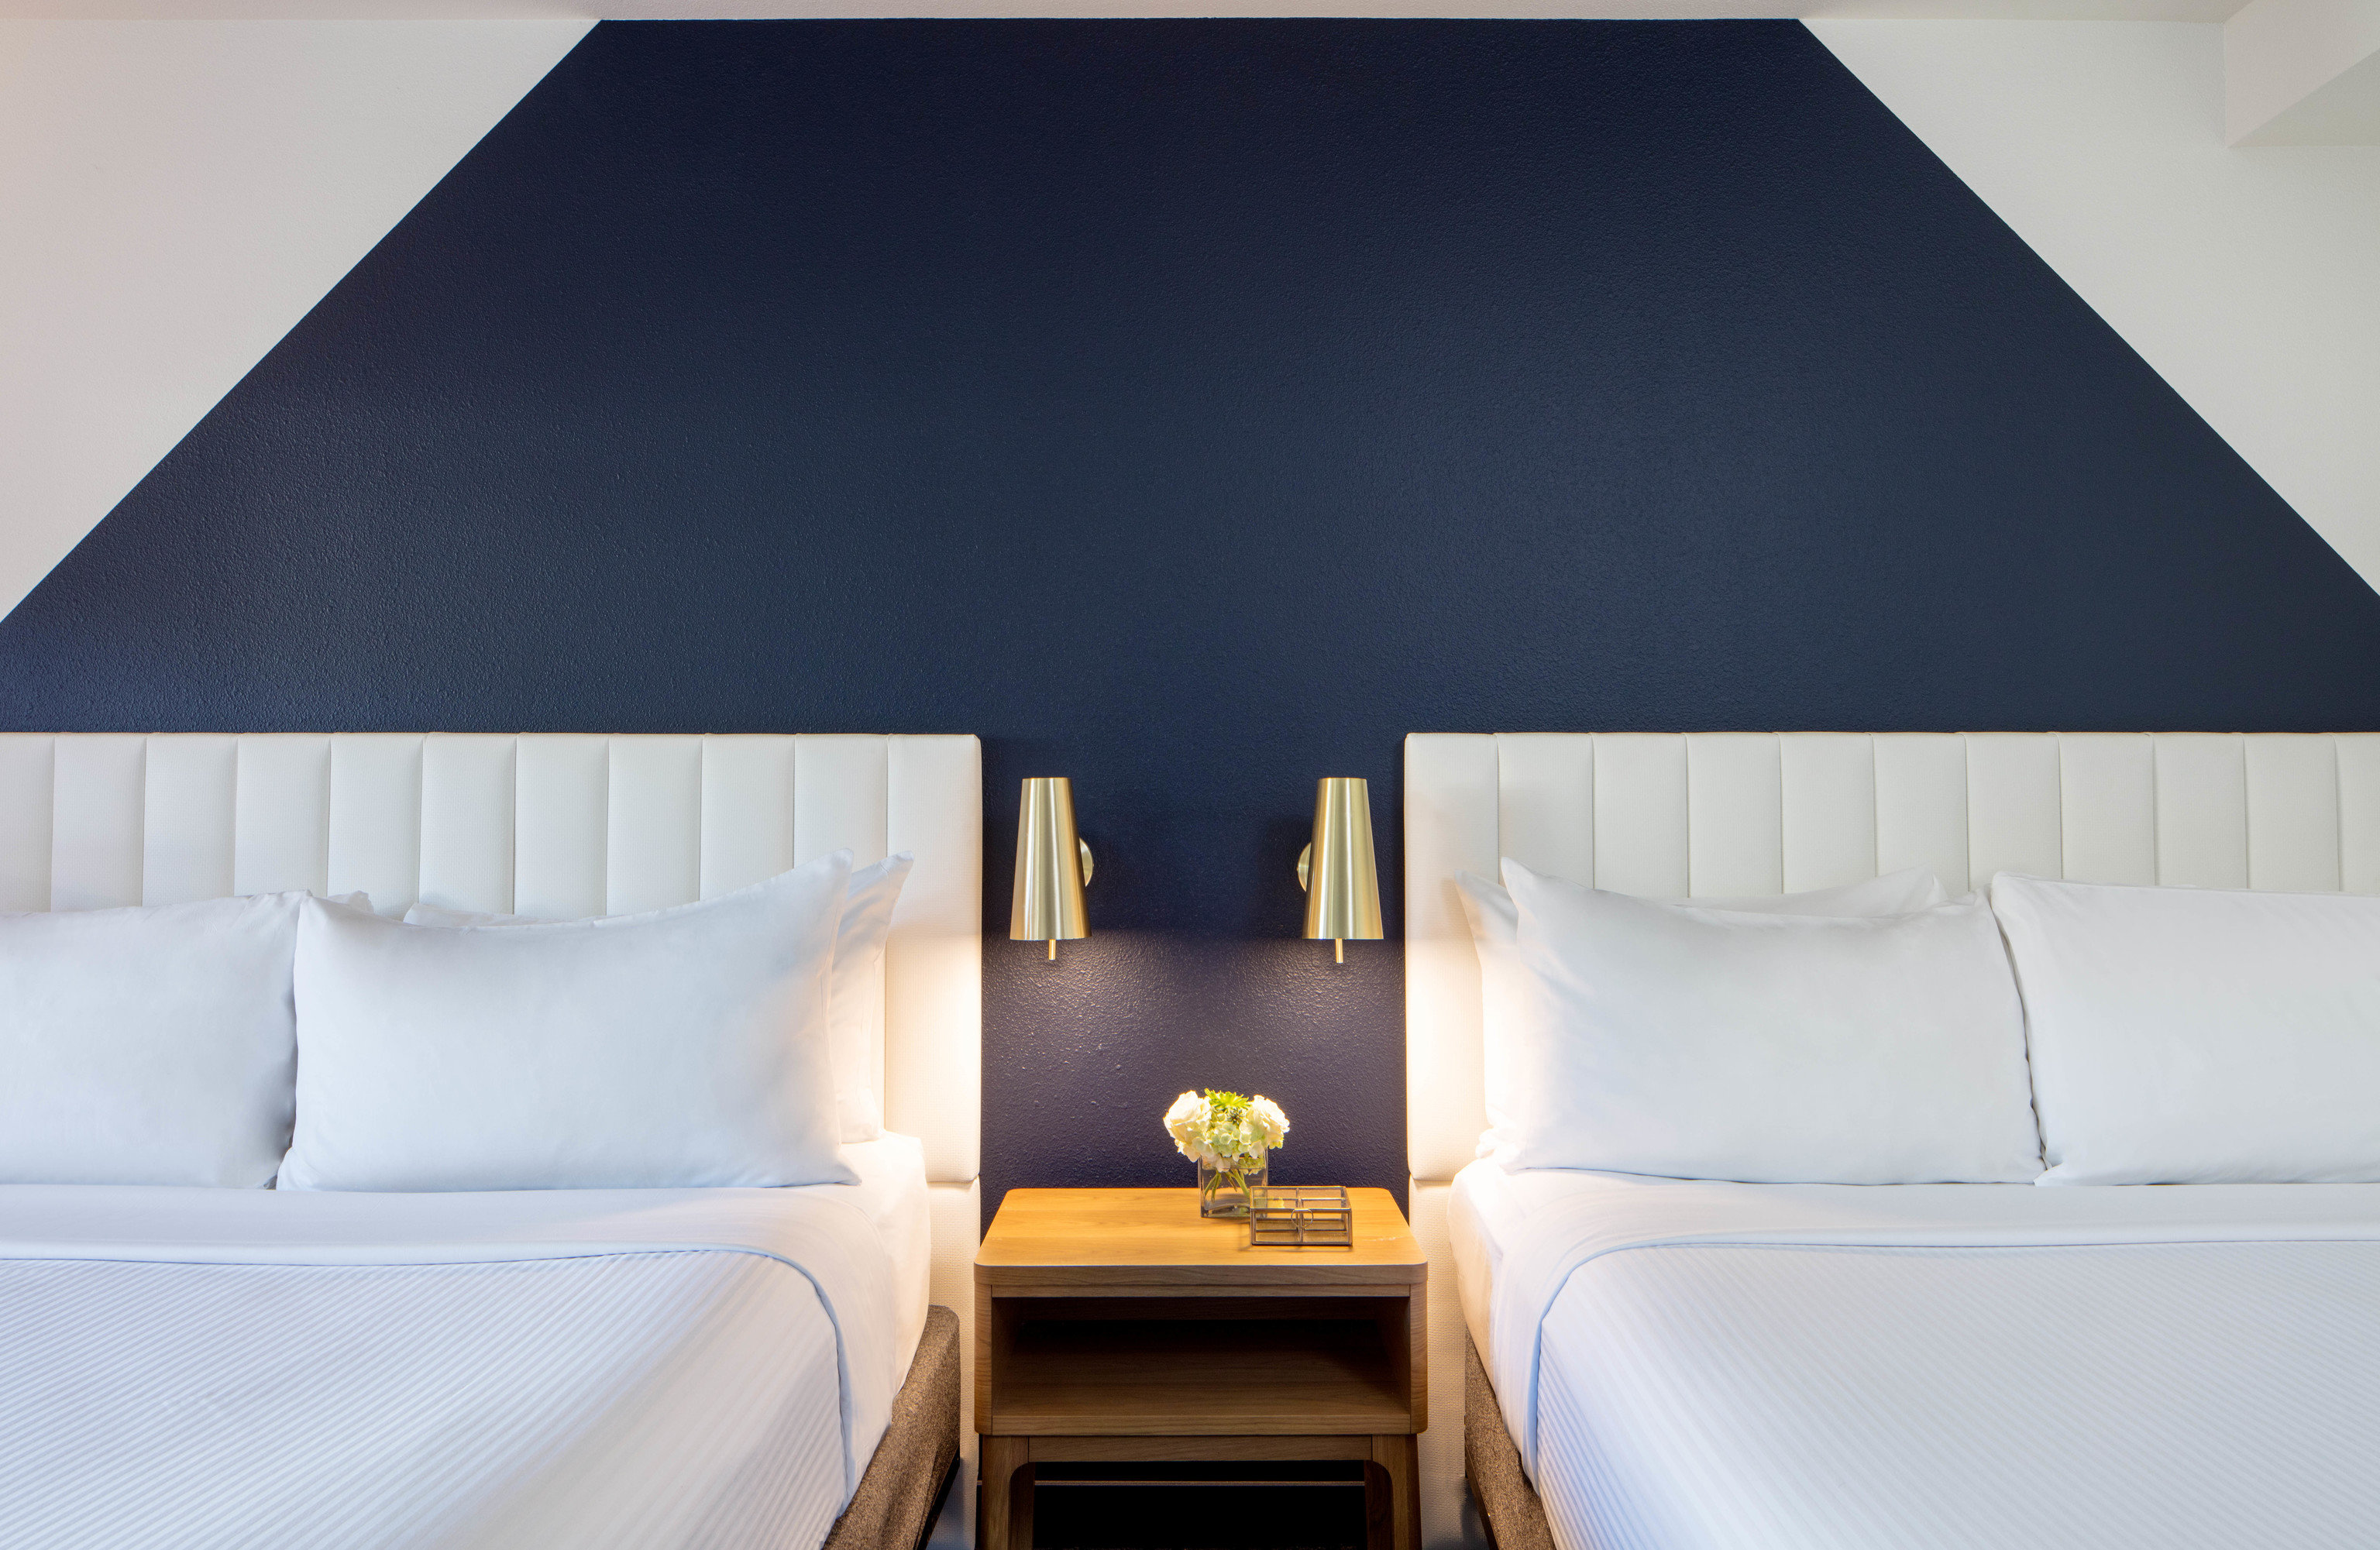 Suite product design angle daylighting Bedroom interior designer